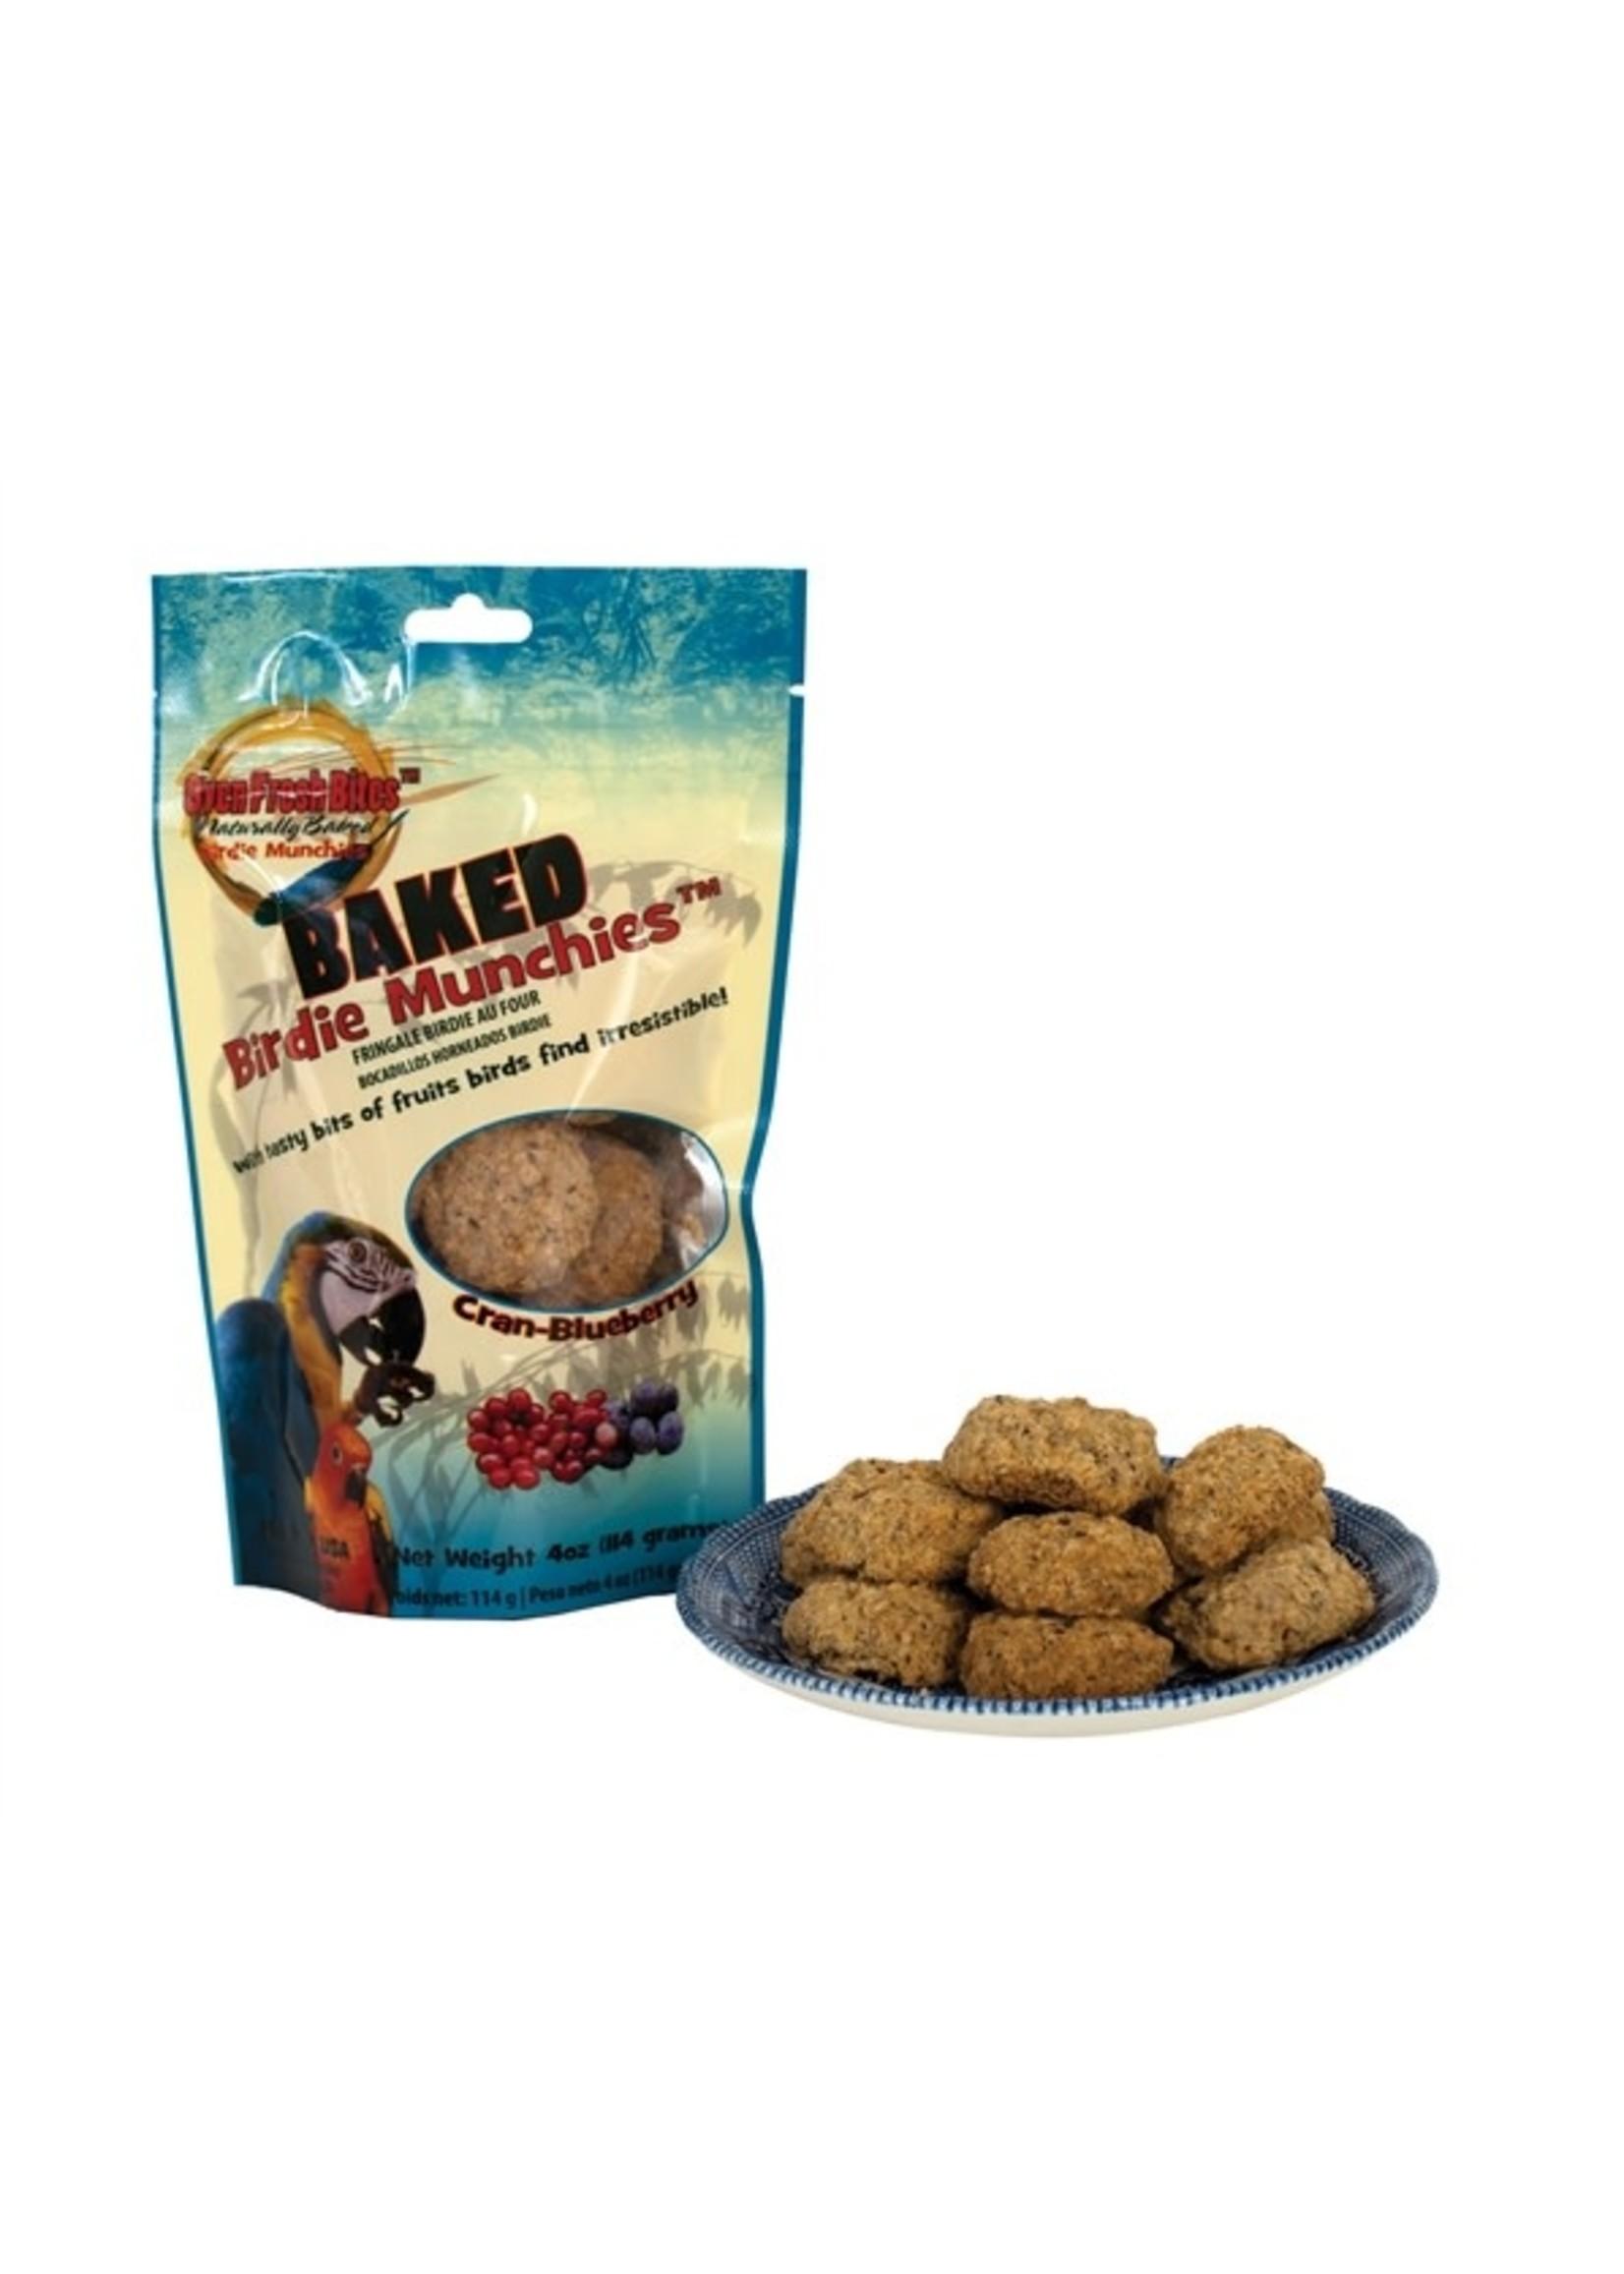 Sunseed/Vitakraft Caitec Birdie Munchies Cran-Blueberry (4oz)